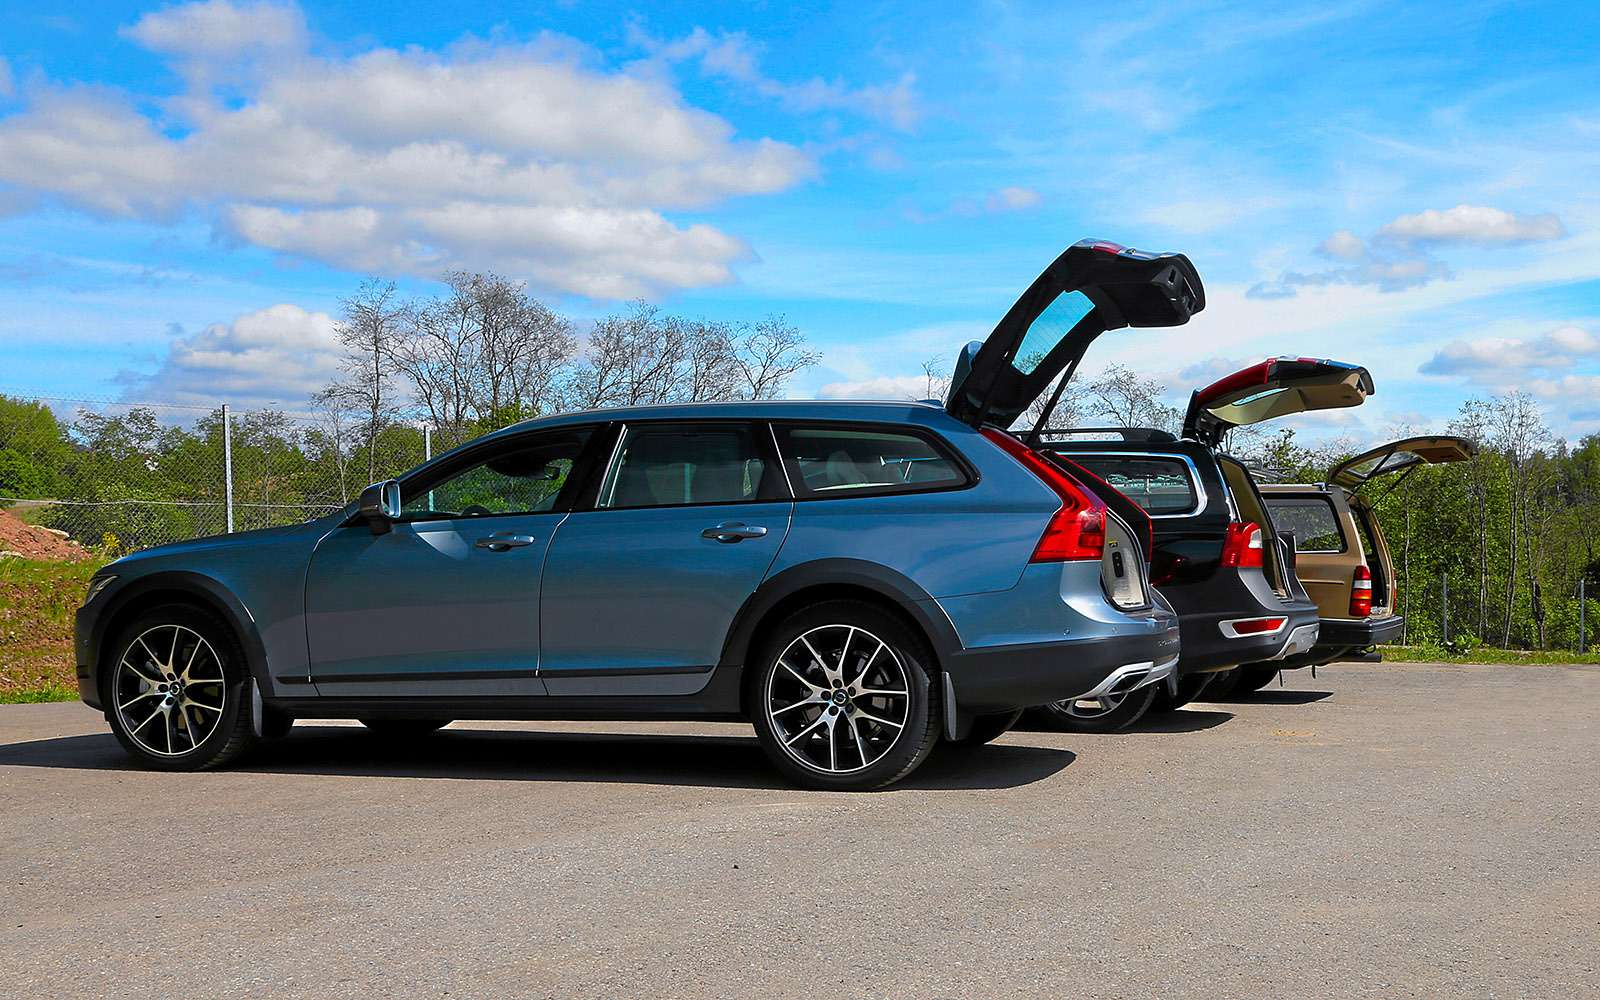 Шведская династия: Volvo V90 Cross Country нафоне предков— фото 776473